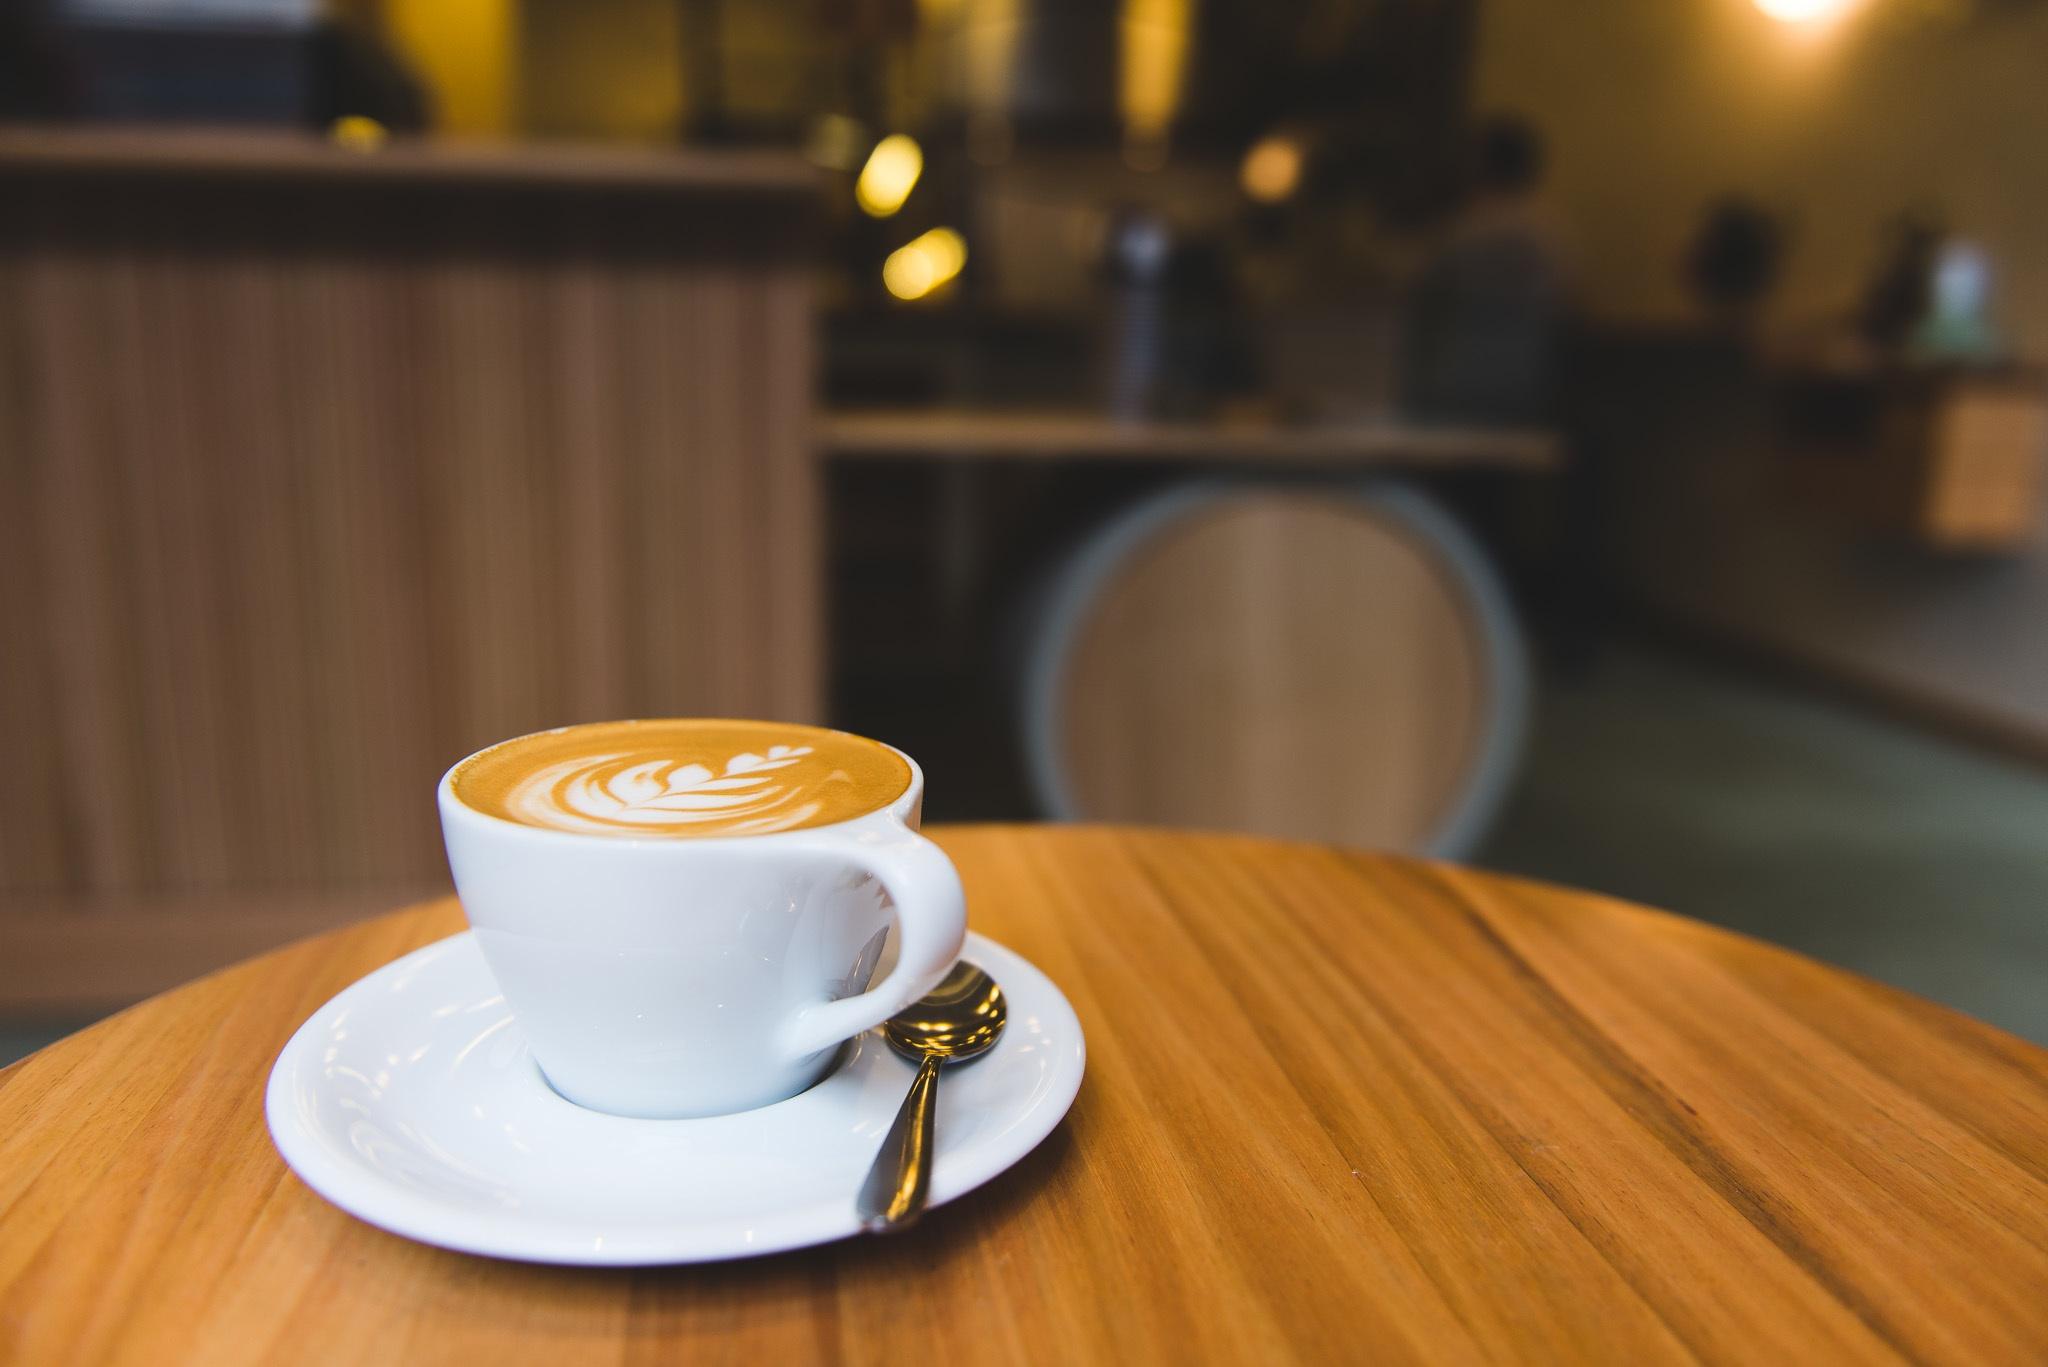 Cafe Coffee Cup Latte Meal Drink Espresso Hot Beverage